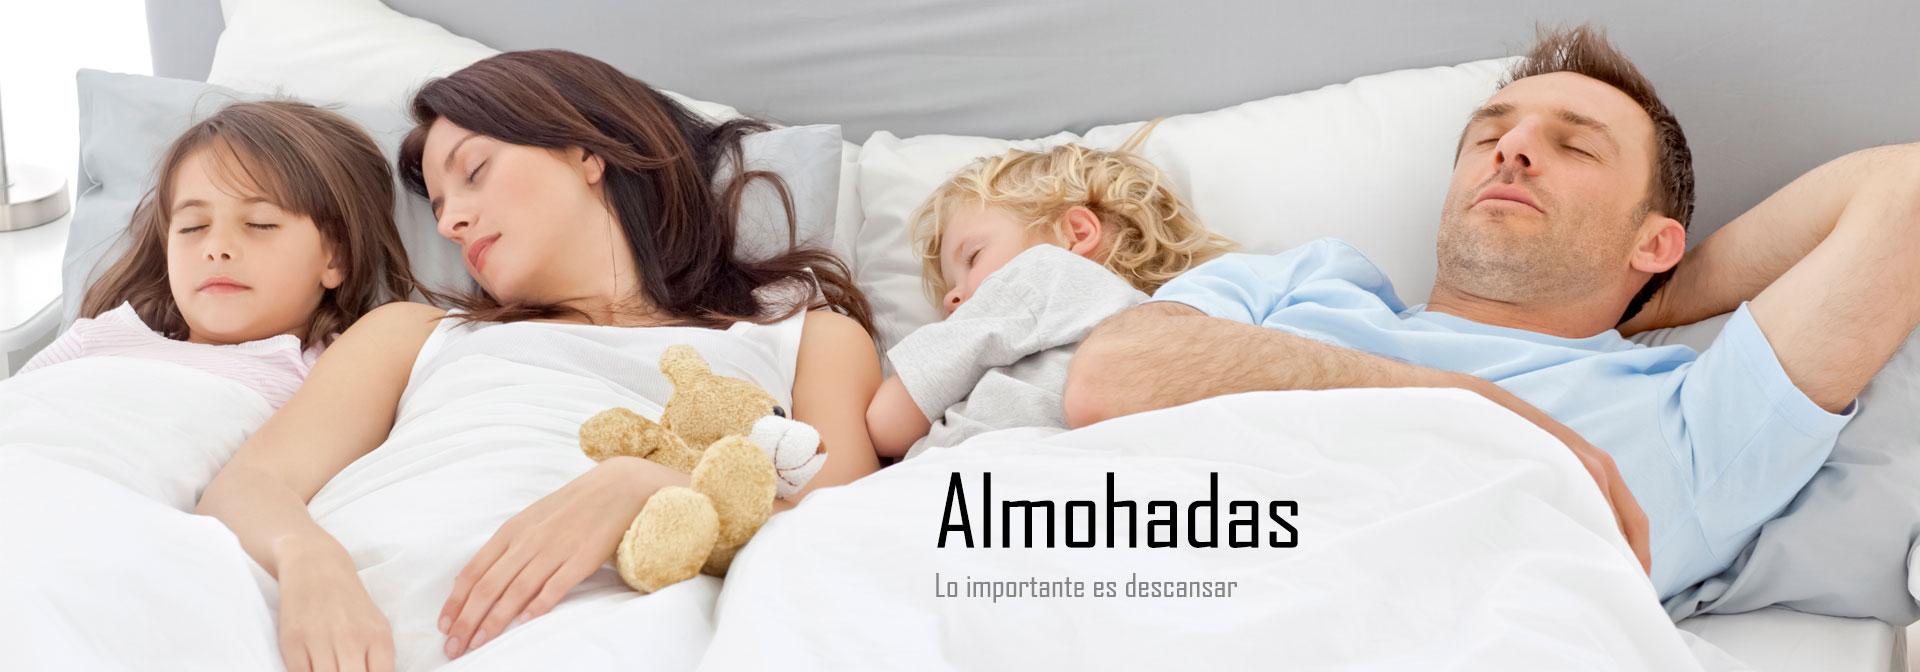 Almohadas1